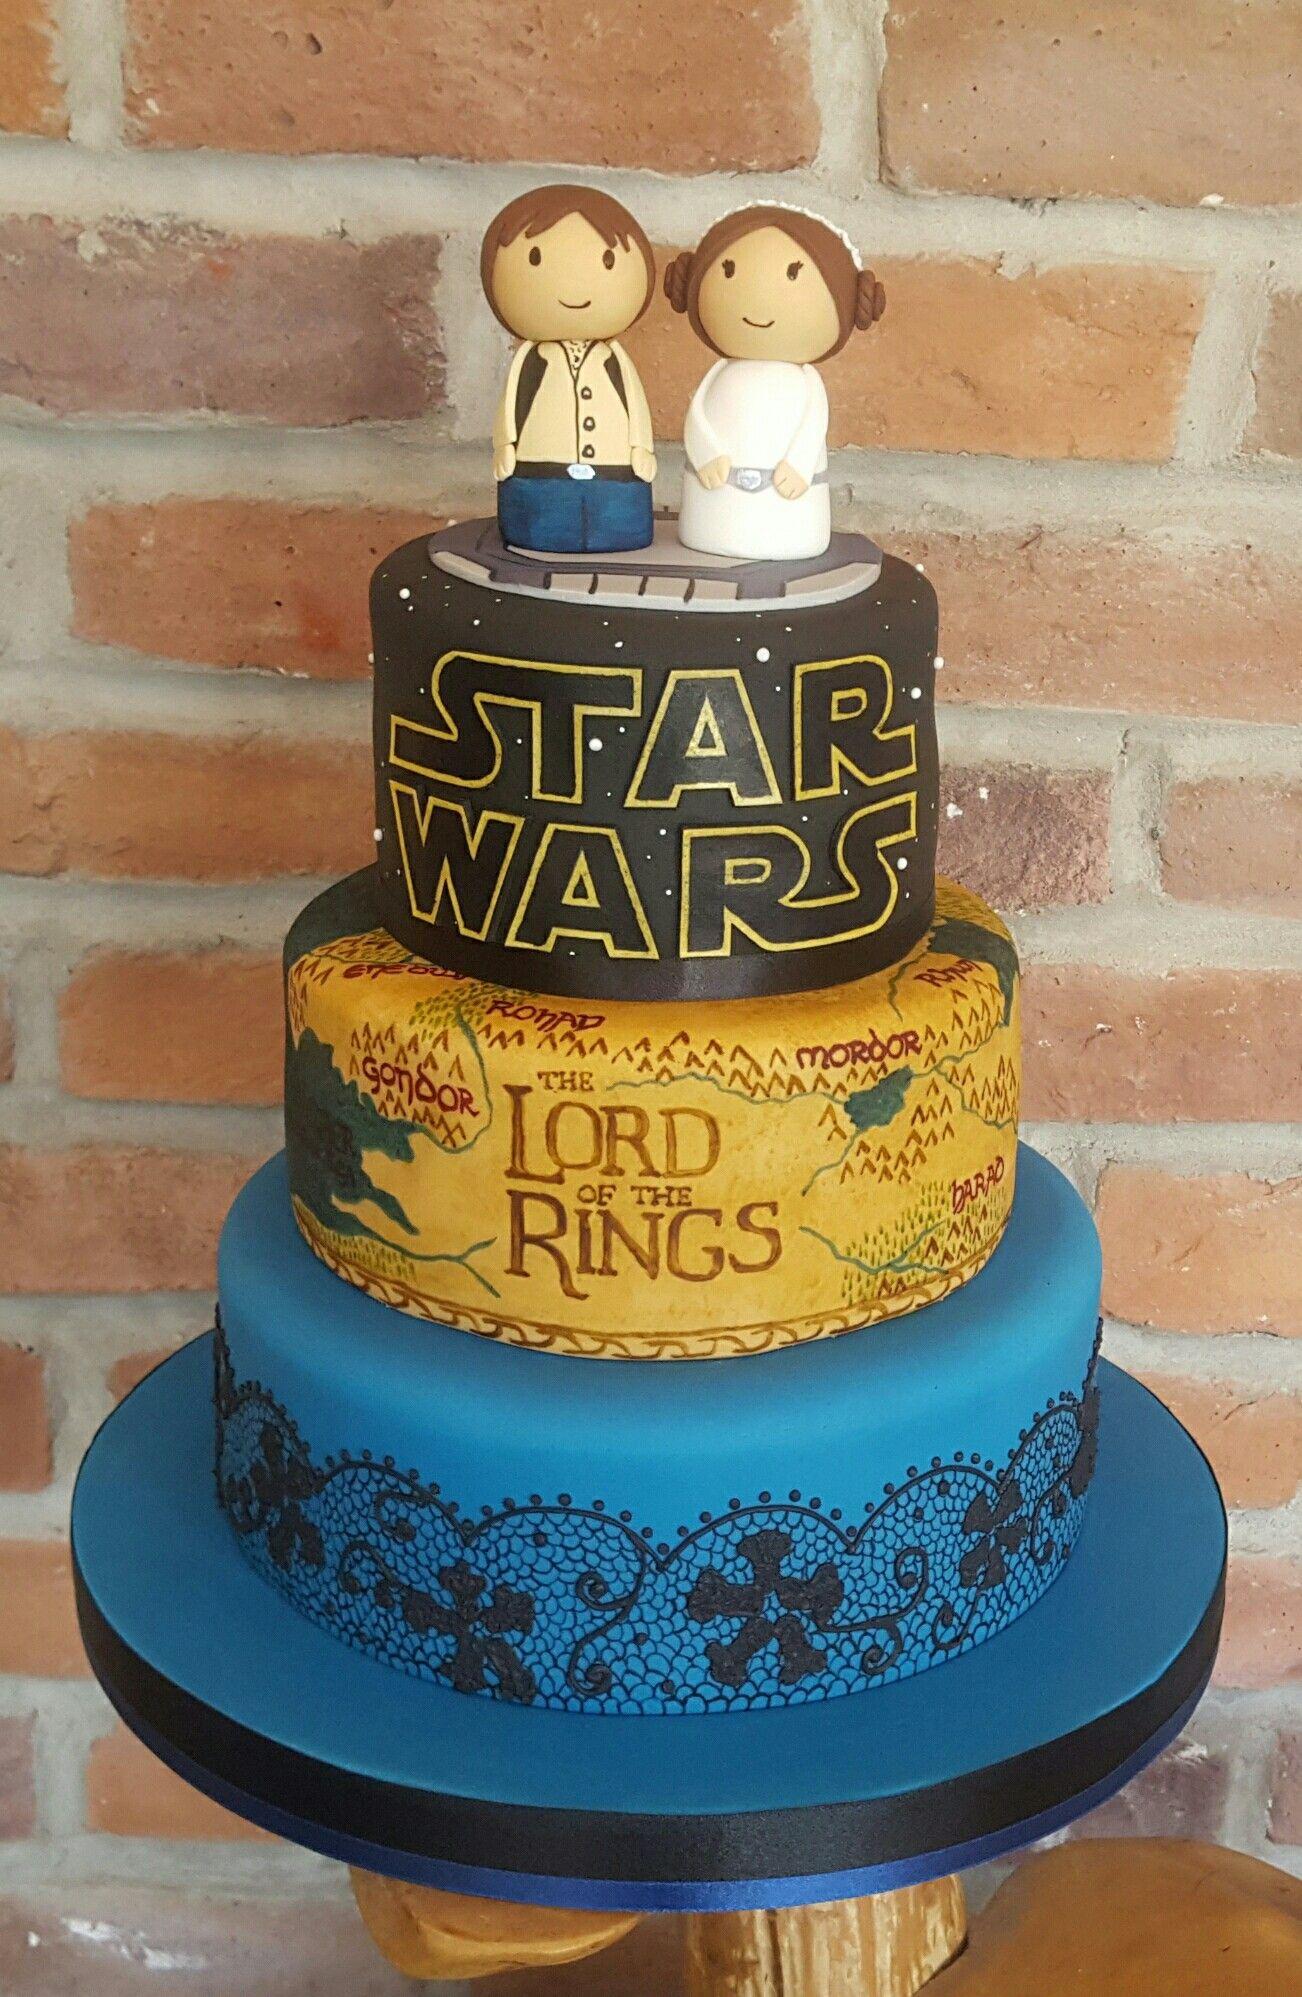 13+ Star wars wedding ring box ideas in 2021